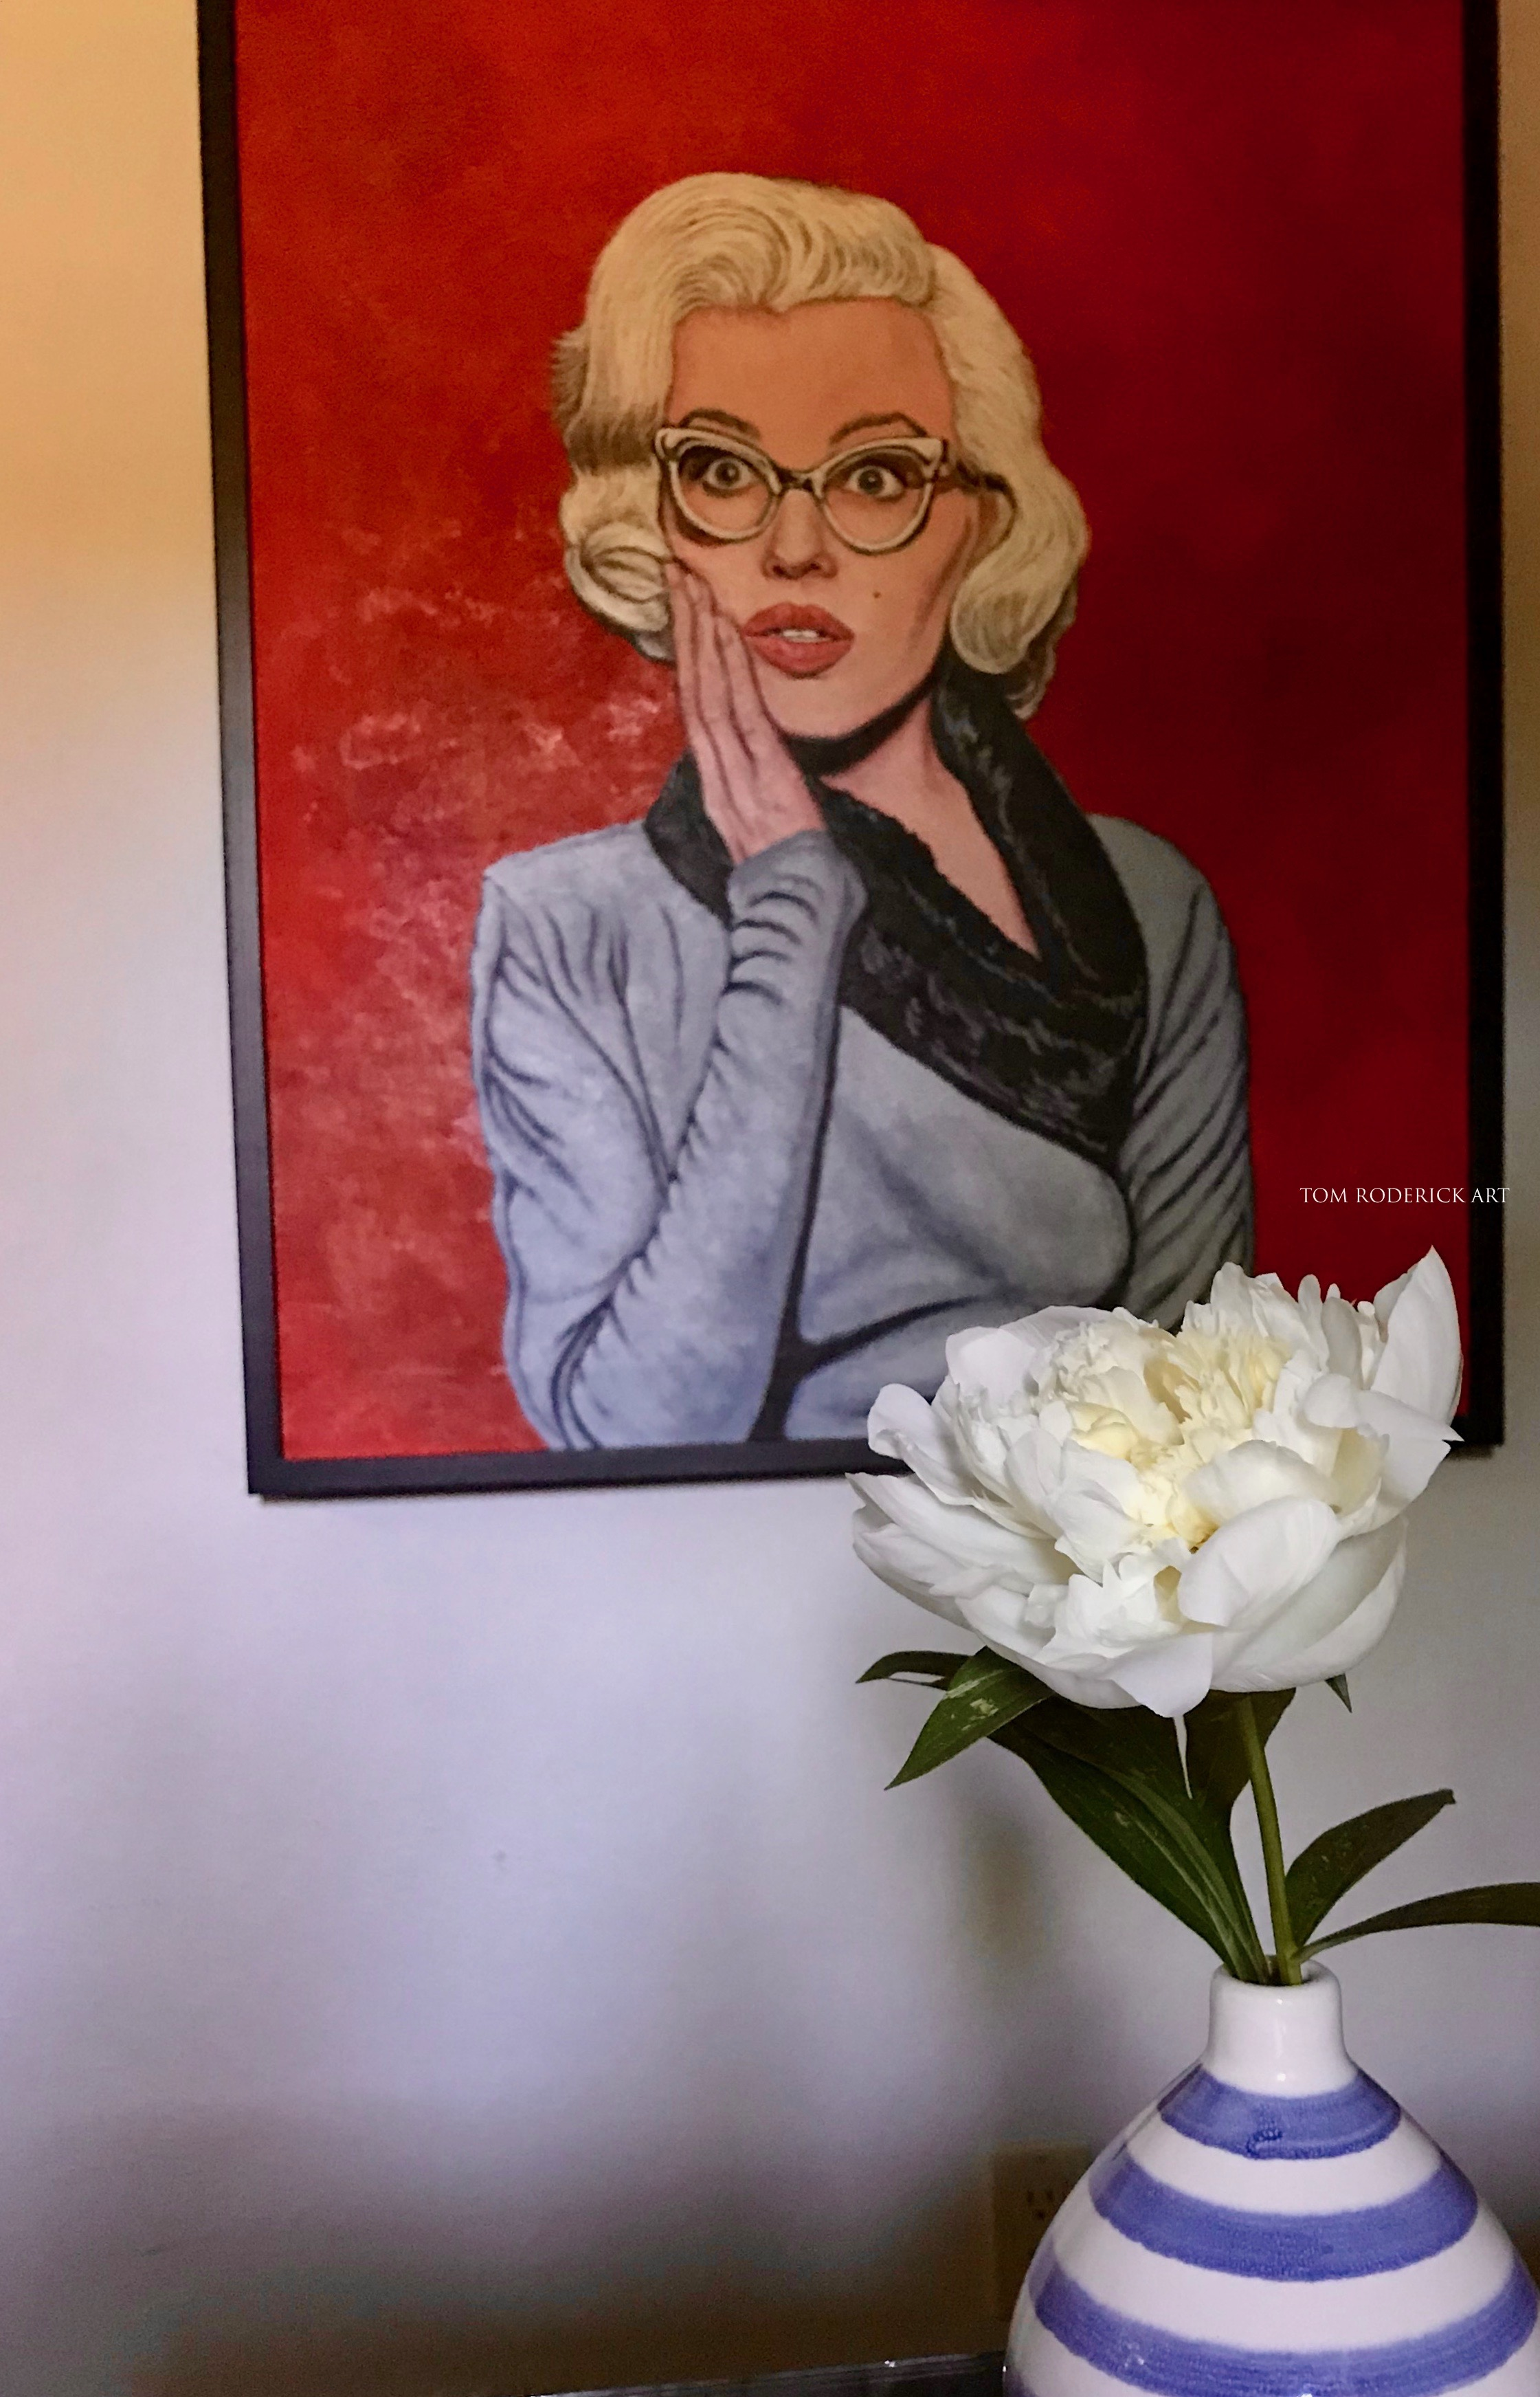 OMG portrait of Marilyn Monroe by Boulder portrait artist Tom Roderick.